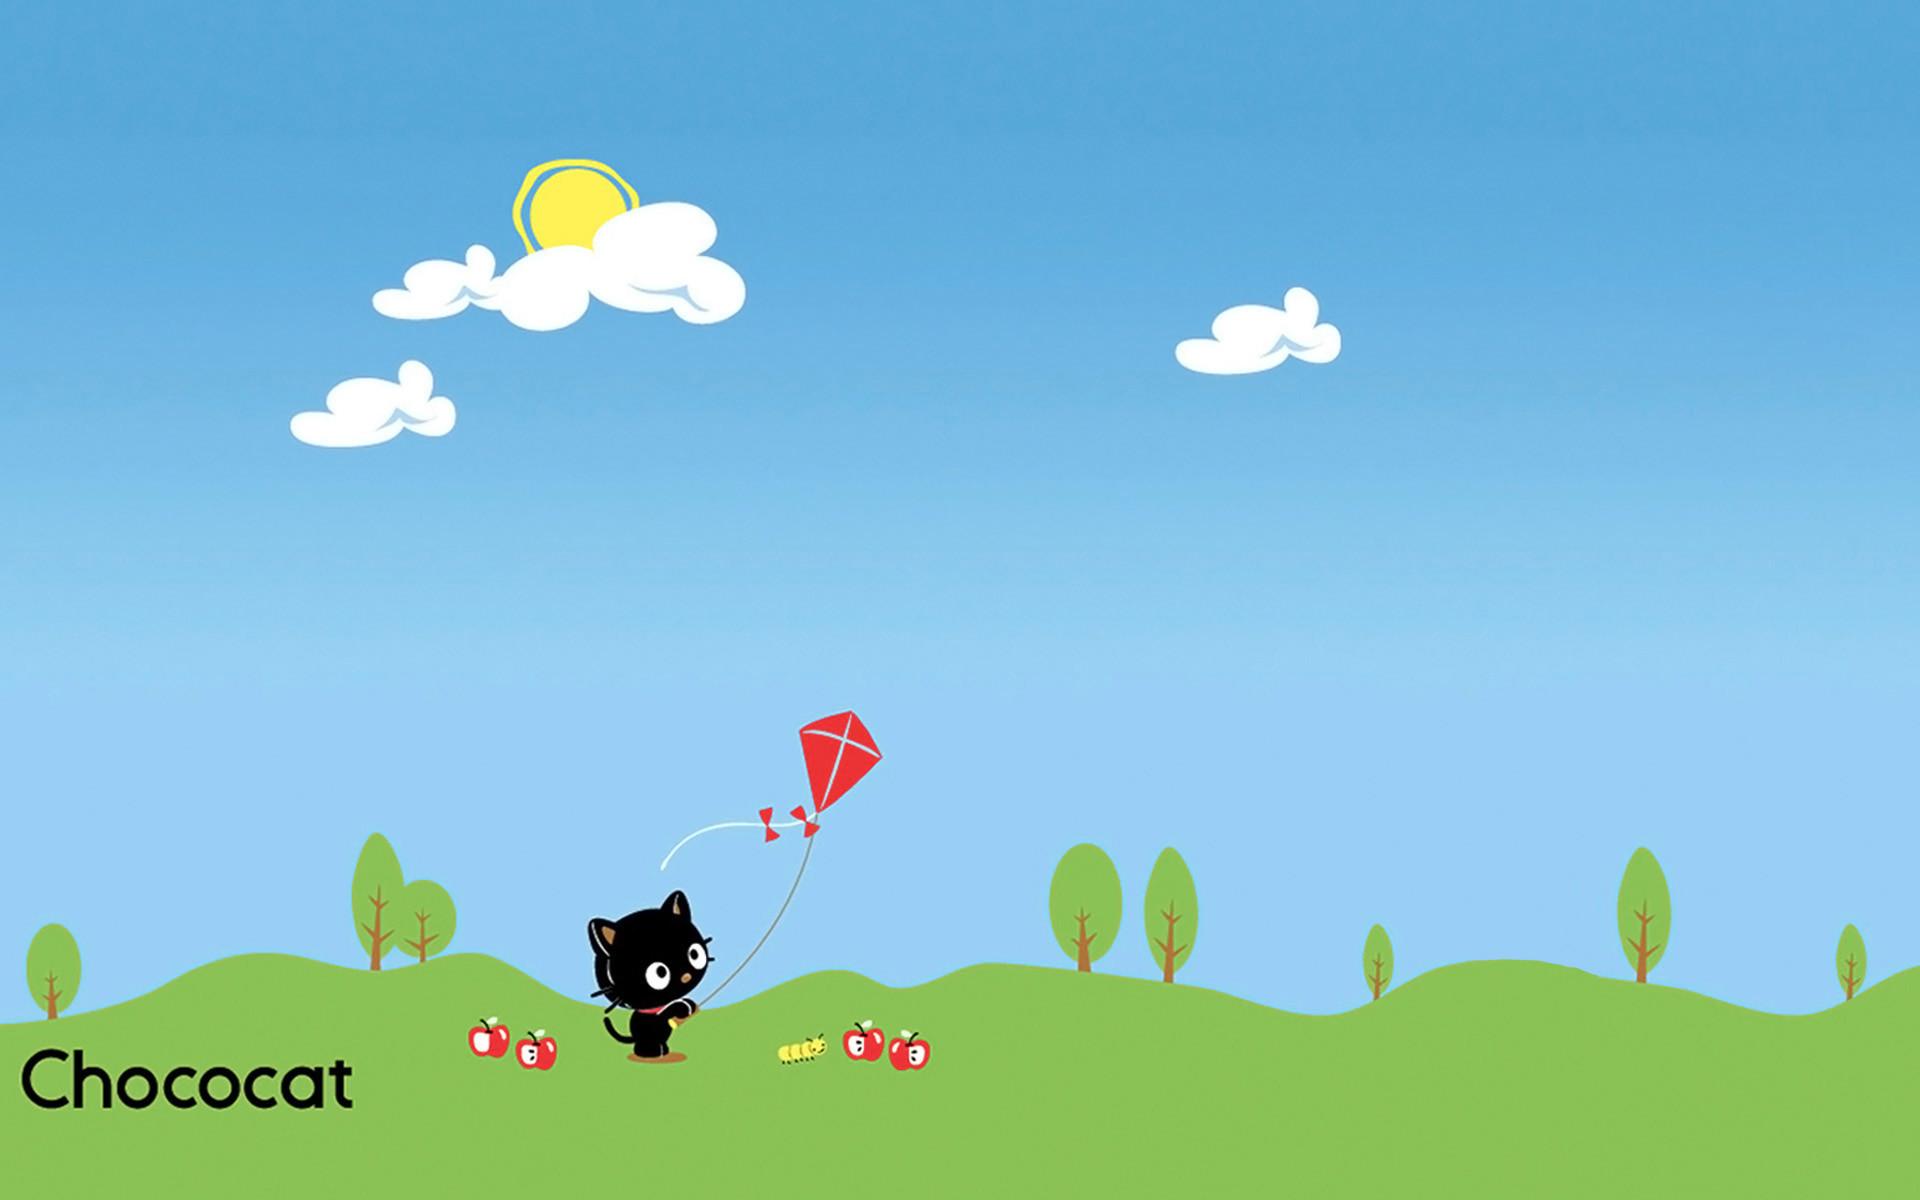 Res: 1920x1200, chococat kite small 1920×1200